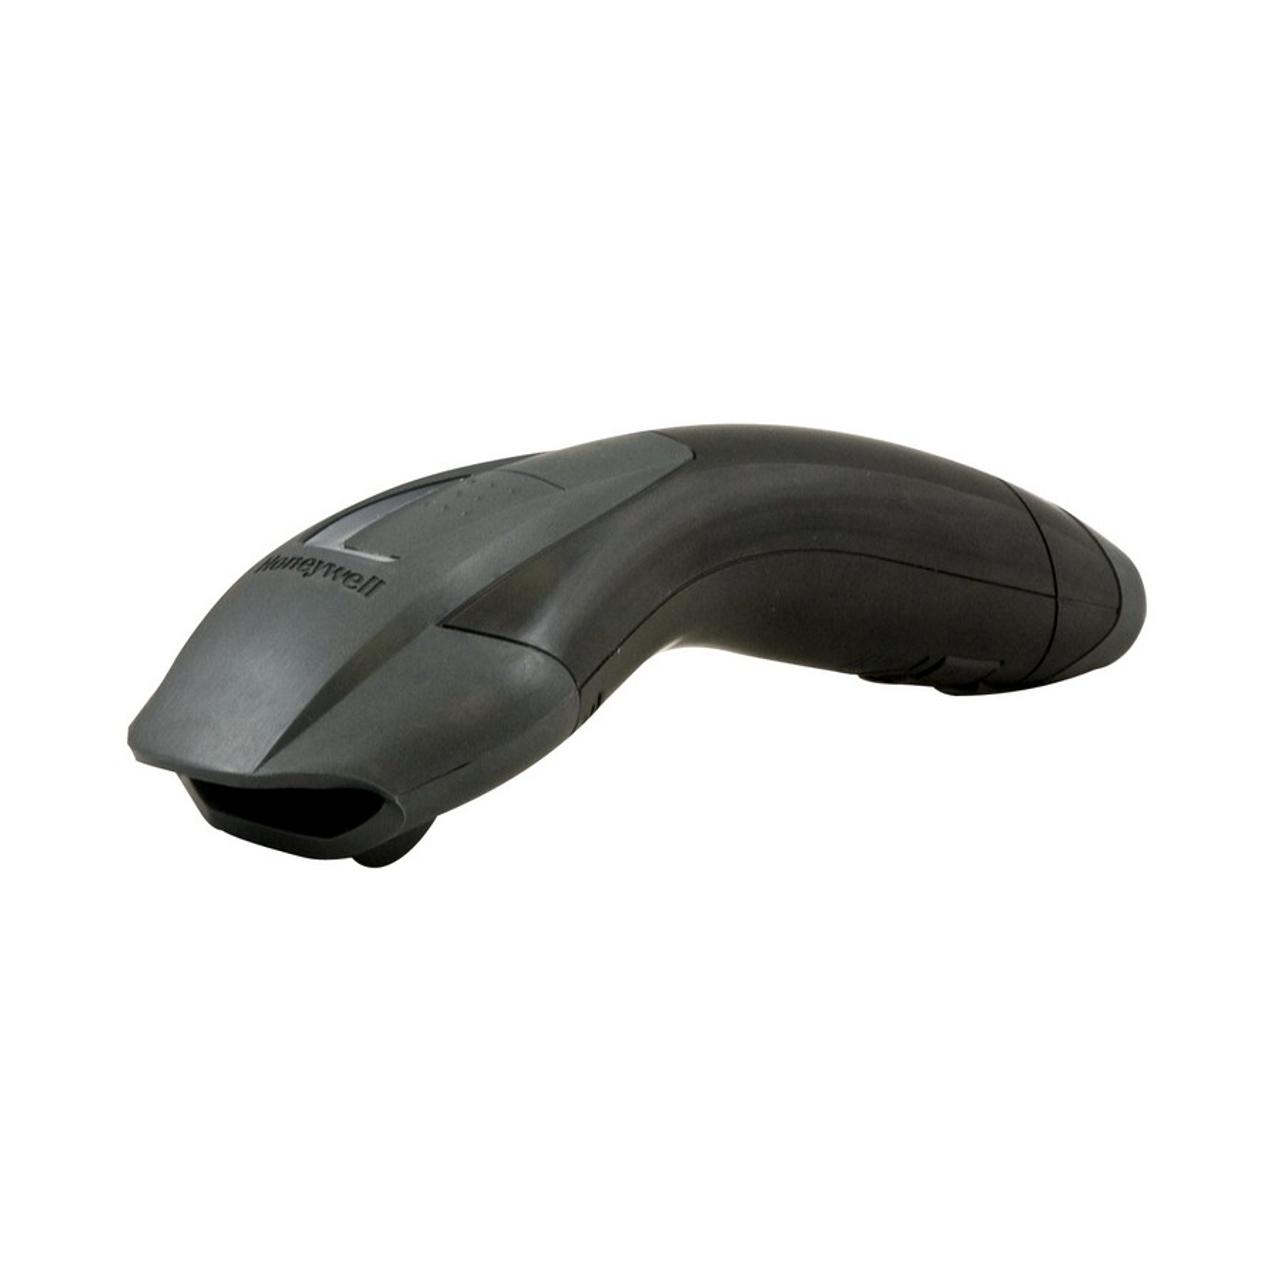 Honeywell Voyager 1200G POS Barcode Scanner